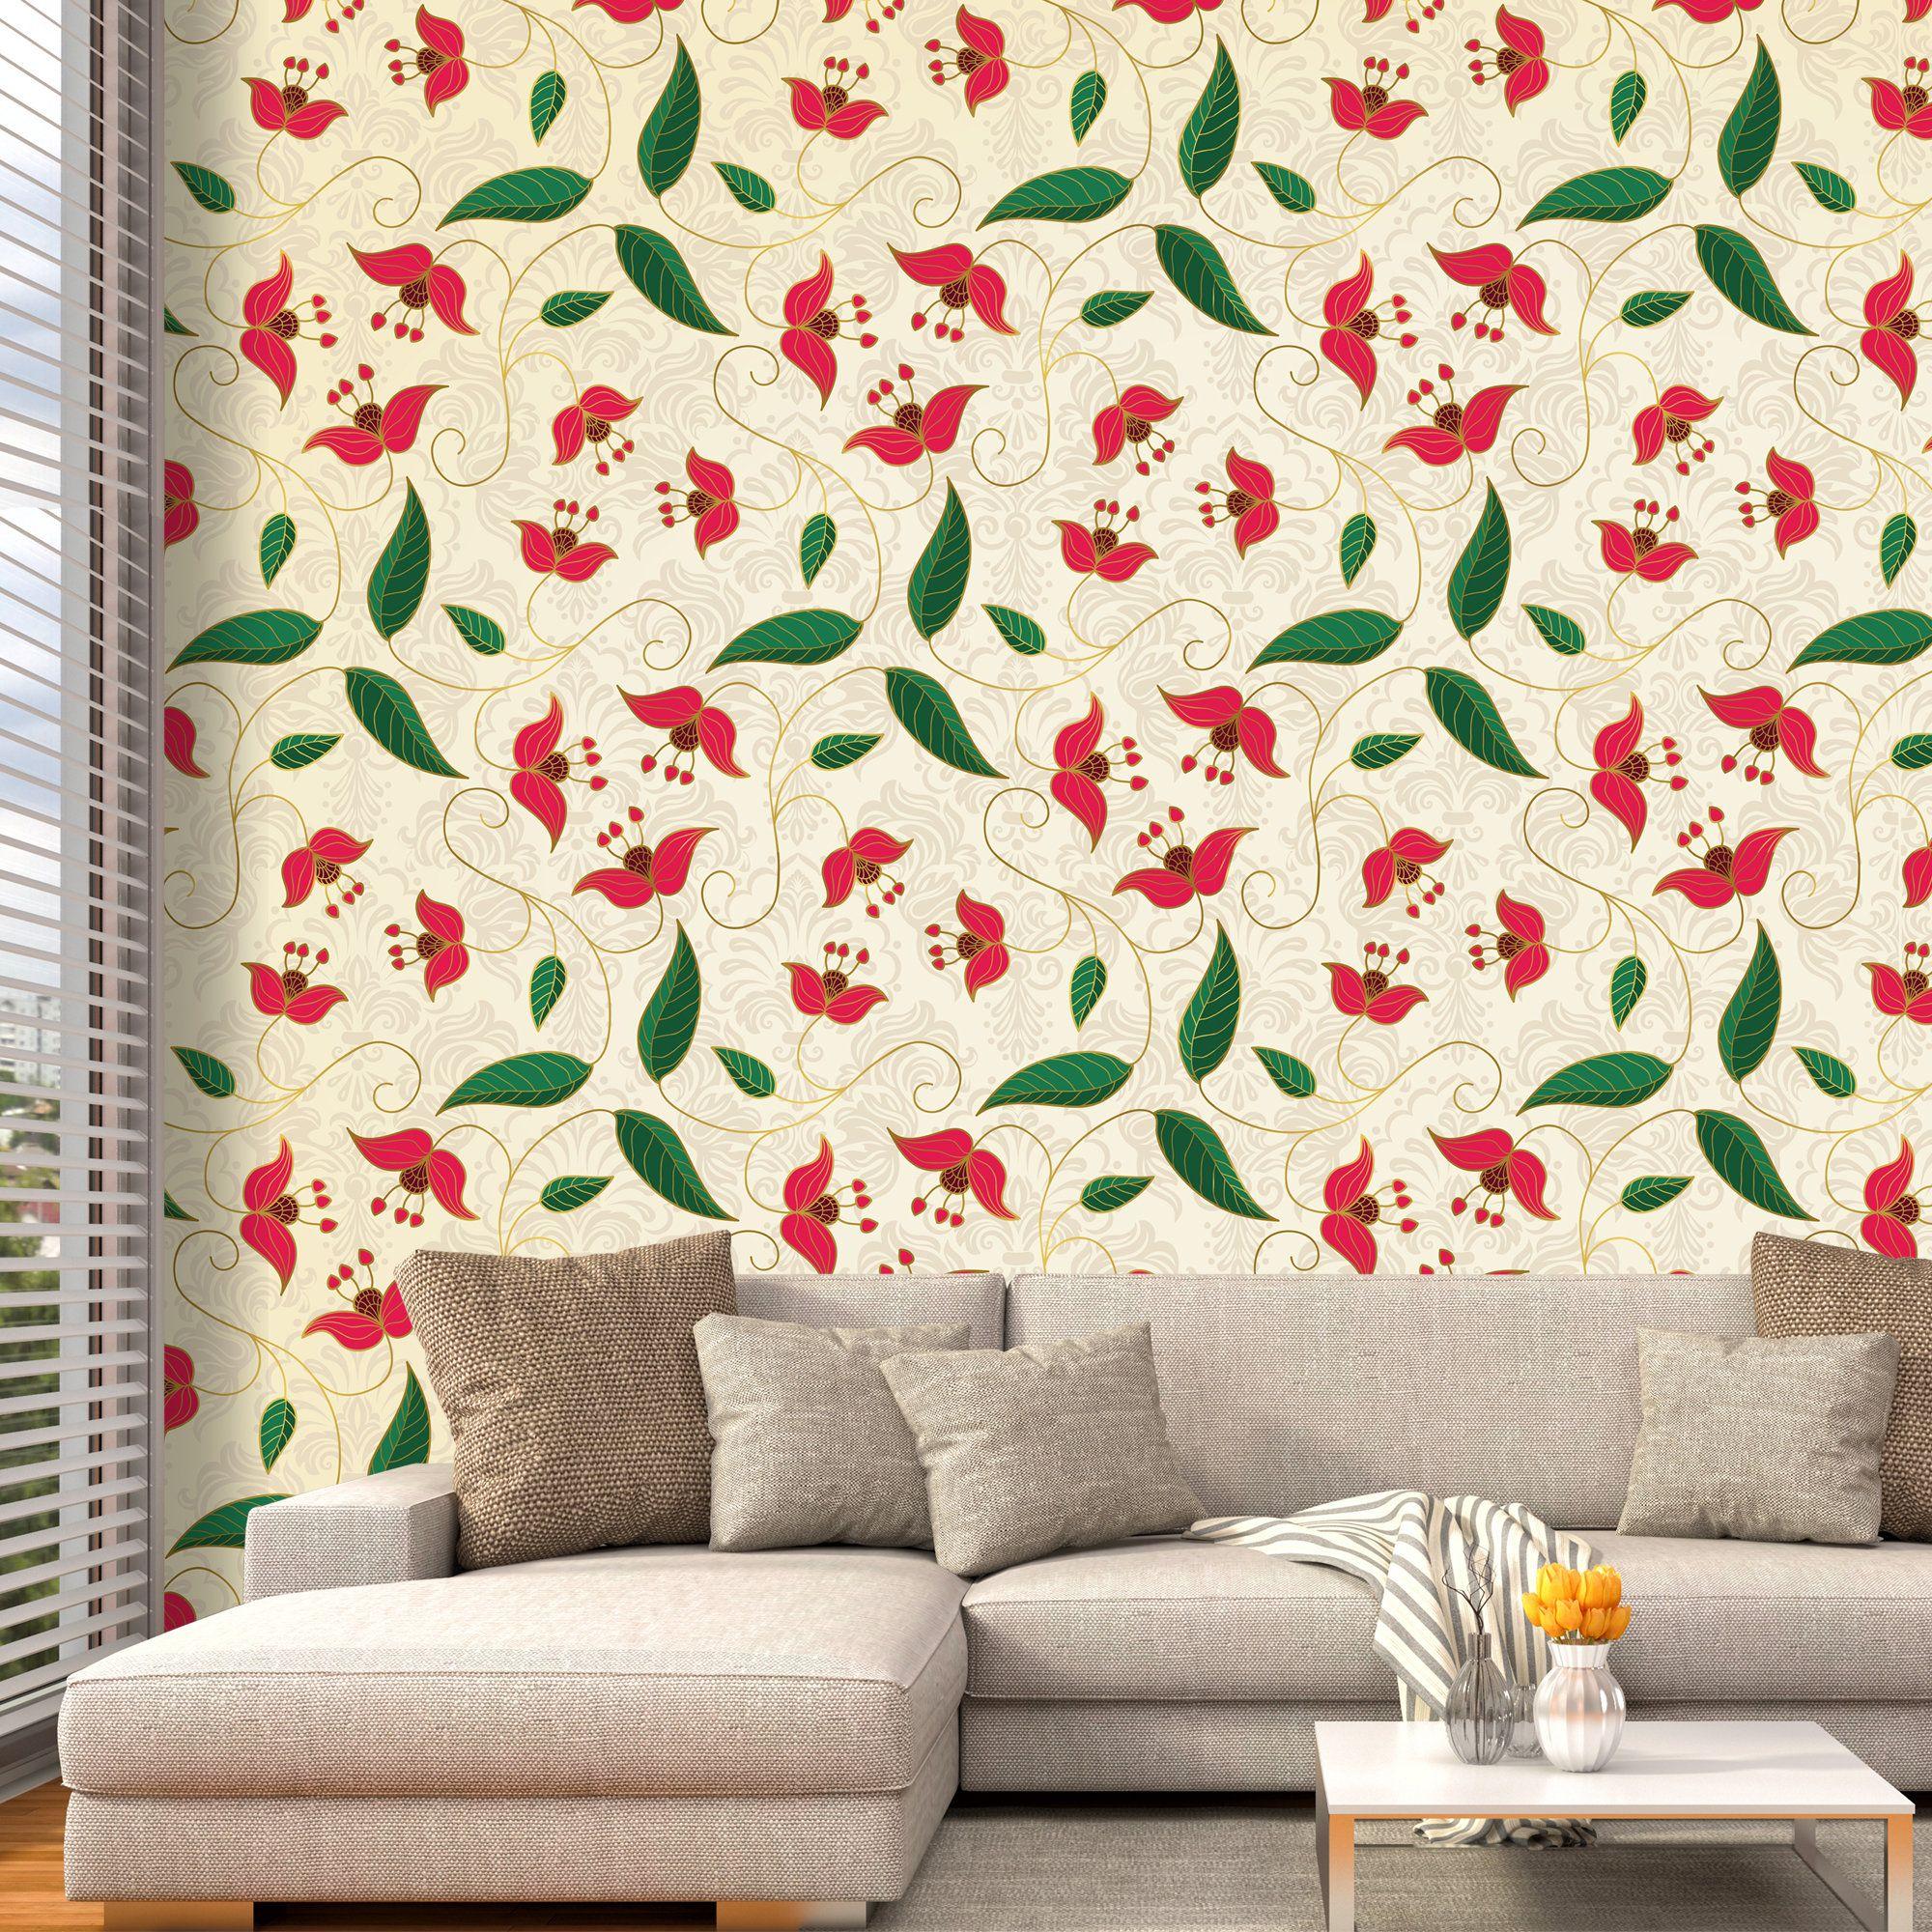 Indian Art Wallpaper Removable Wallpaper Leaf Wall Mural Etsy In 2020 Removable Wallpaper Art Wallpaper Wall Murals